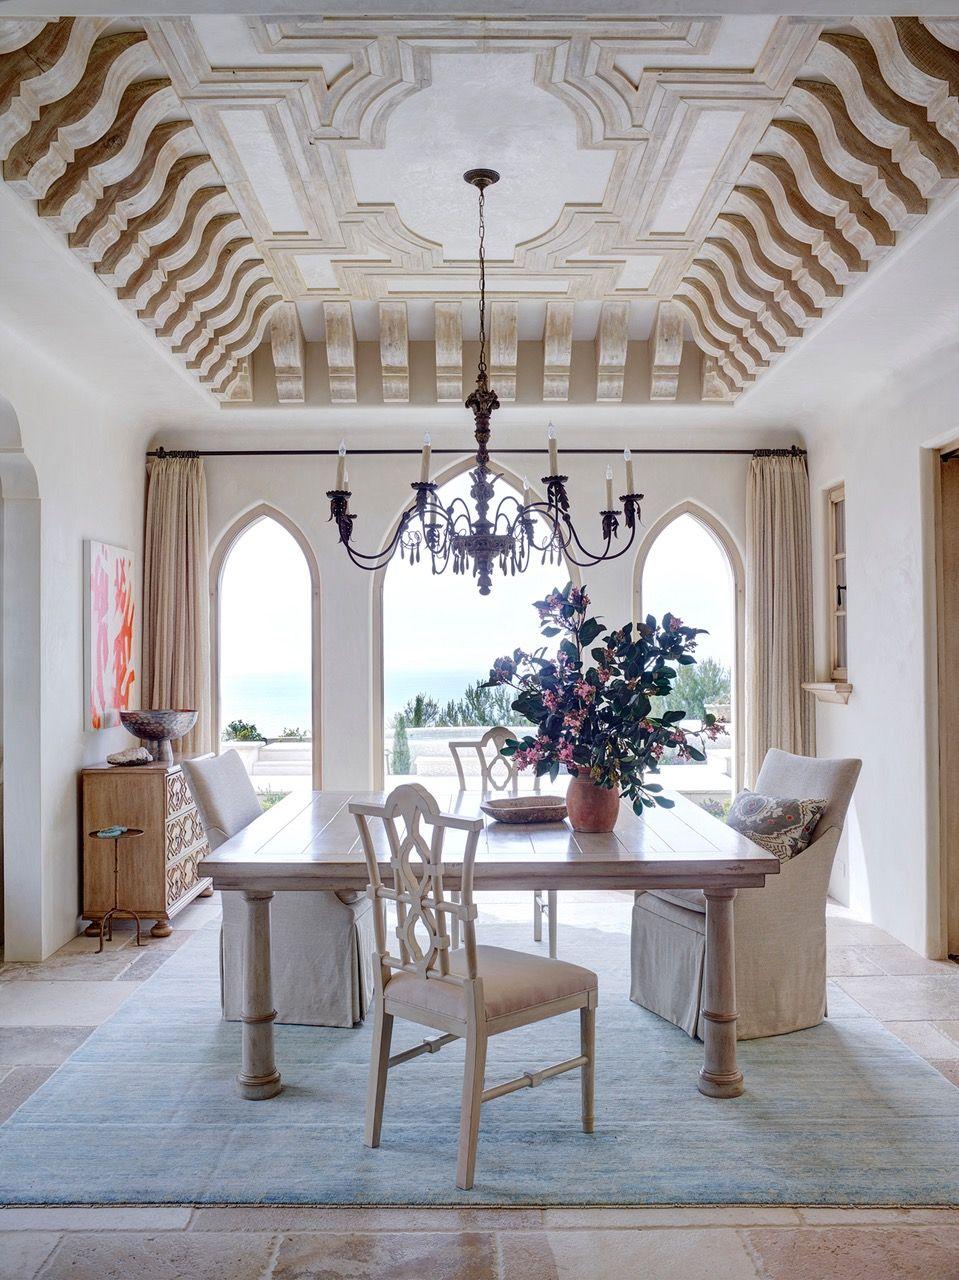 Beau 7d95d81a 00f6 472b Bb04 49784ea002a8 Ohara.davies.gaetano.interiors.haugh.ca.  New Home DesignsHtml ...